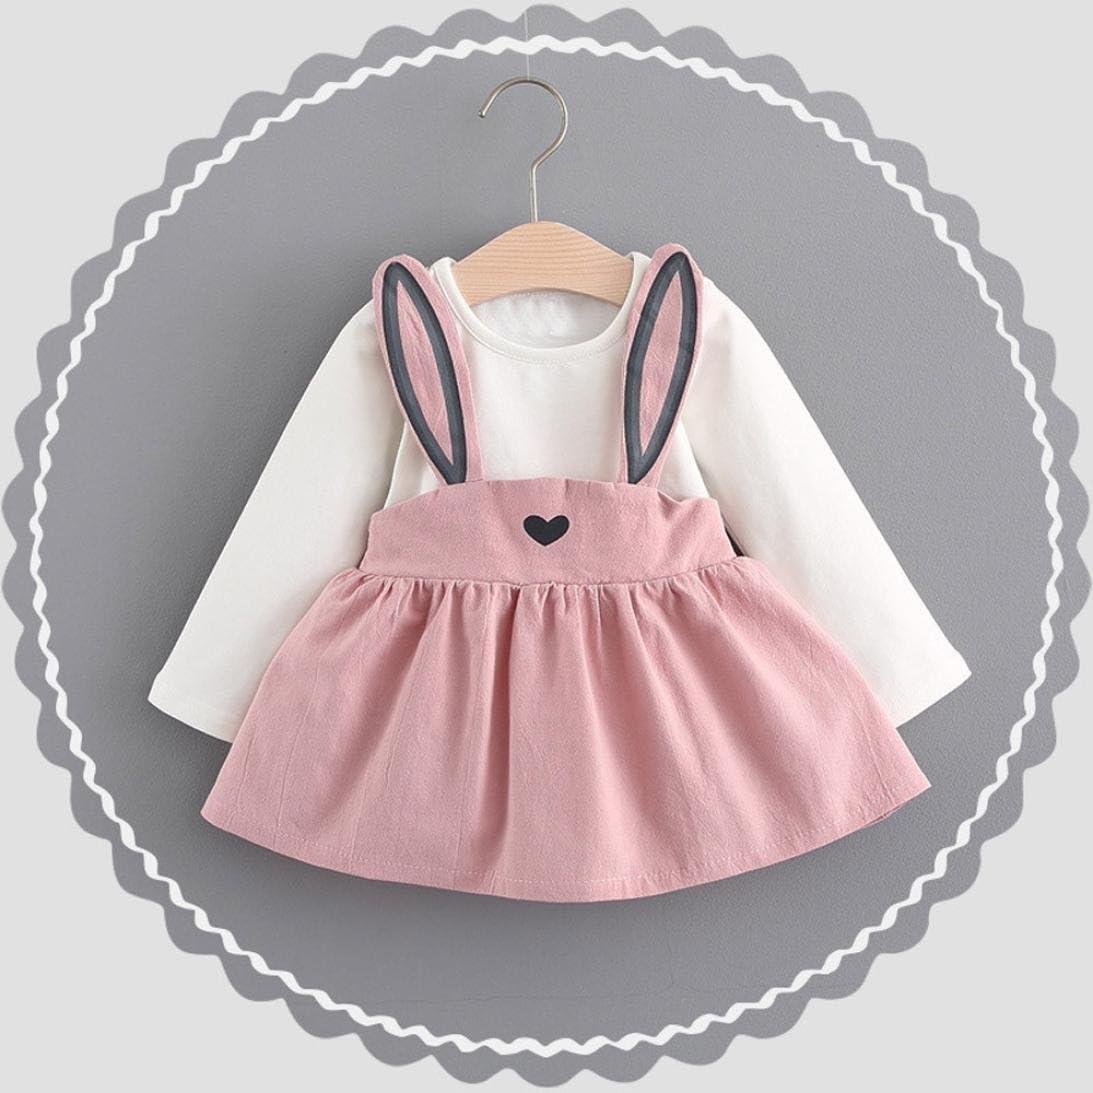 Celendi 0-3 Years Old Spring Cute Rabbit Bandage Suit Mini Dress for Baby Girl